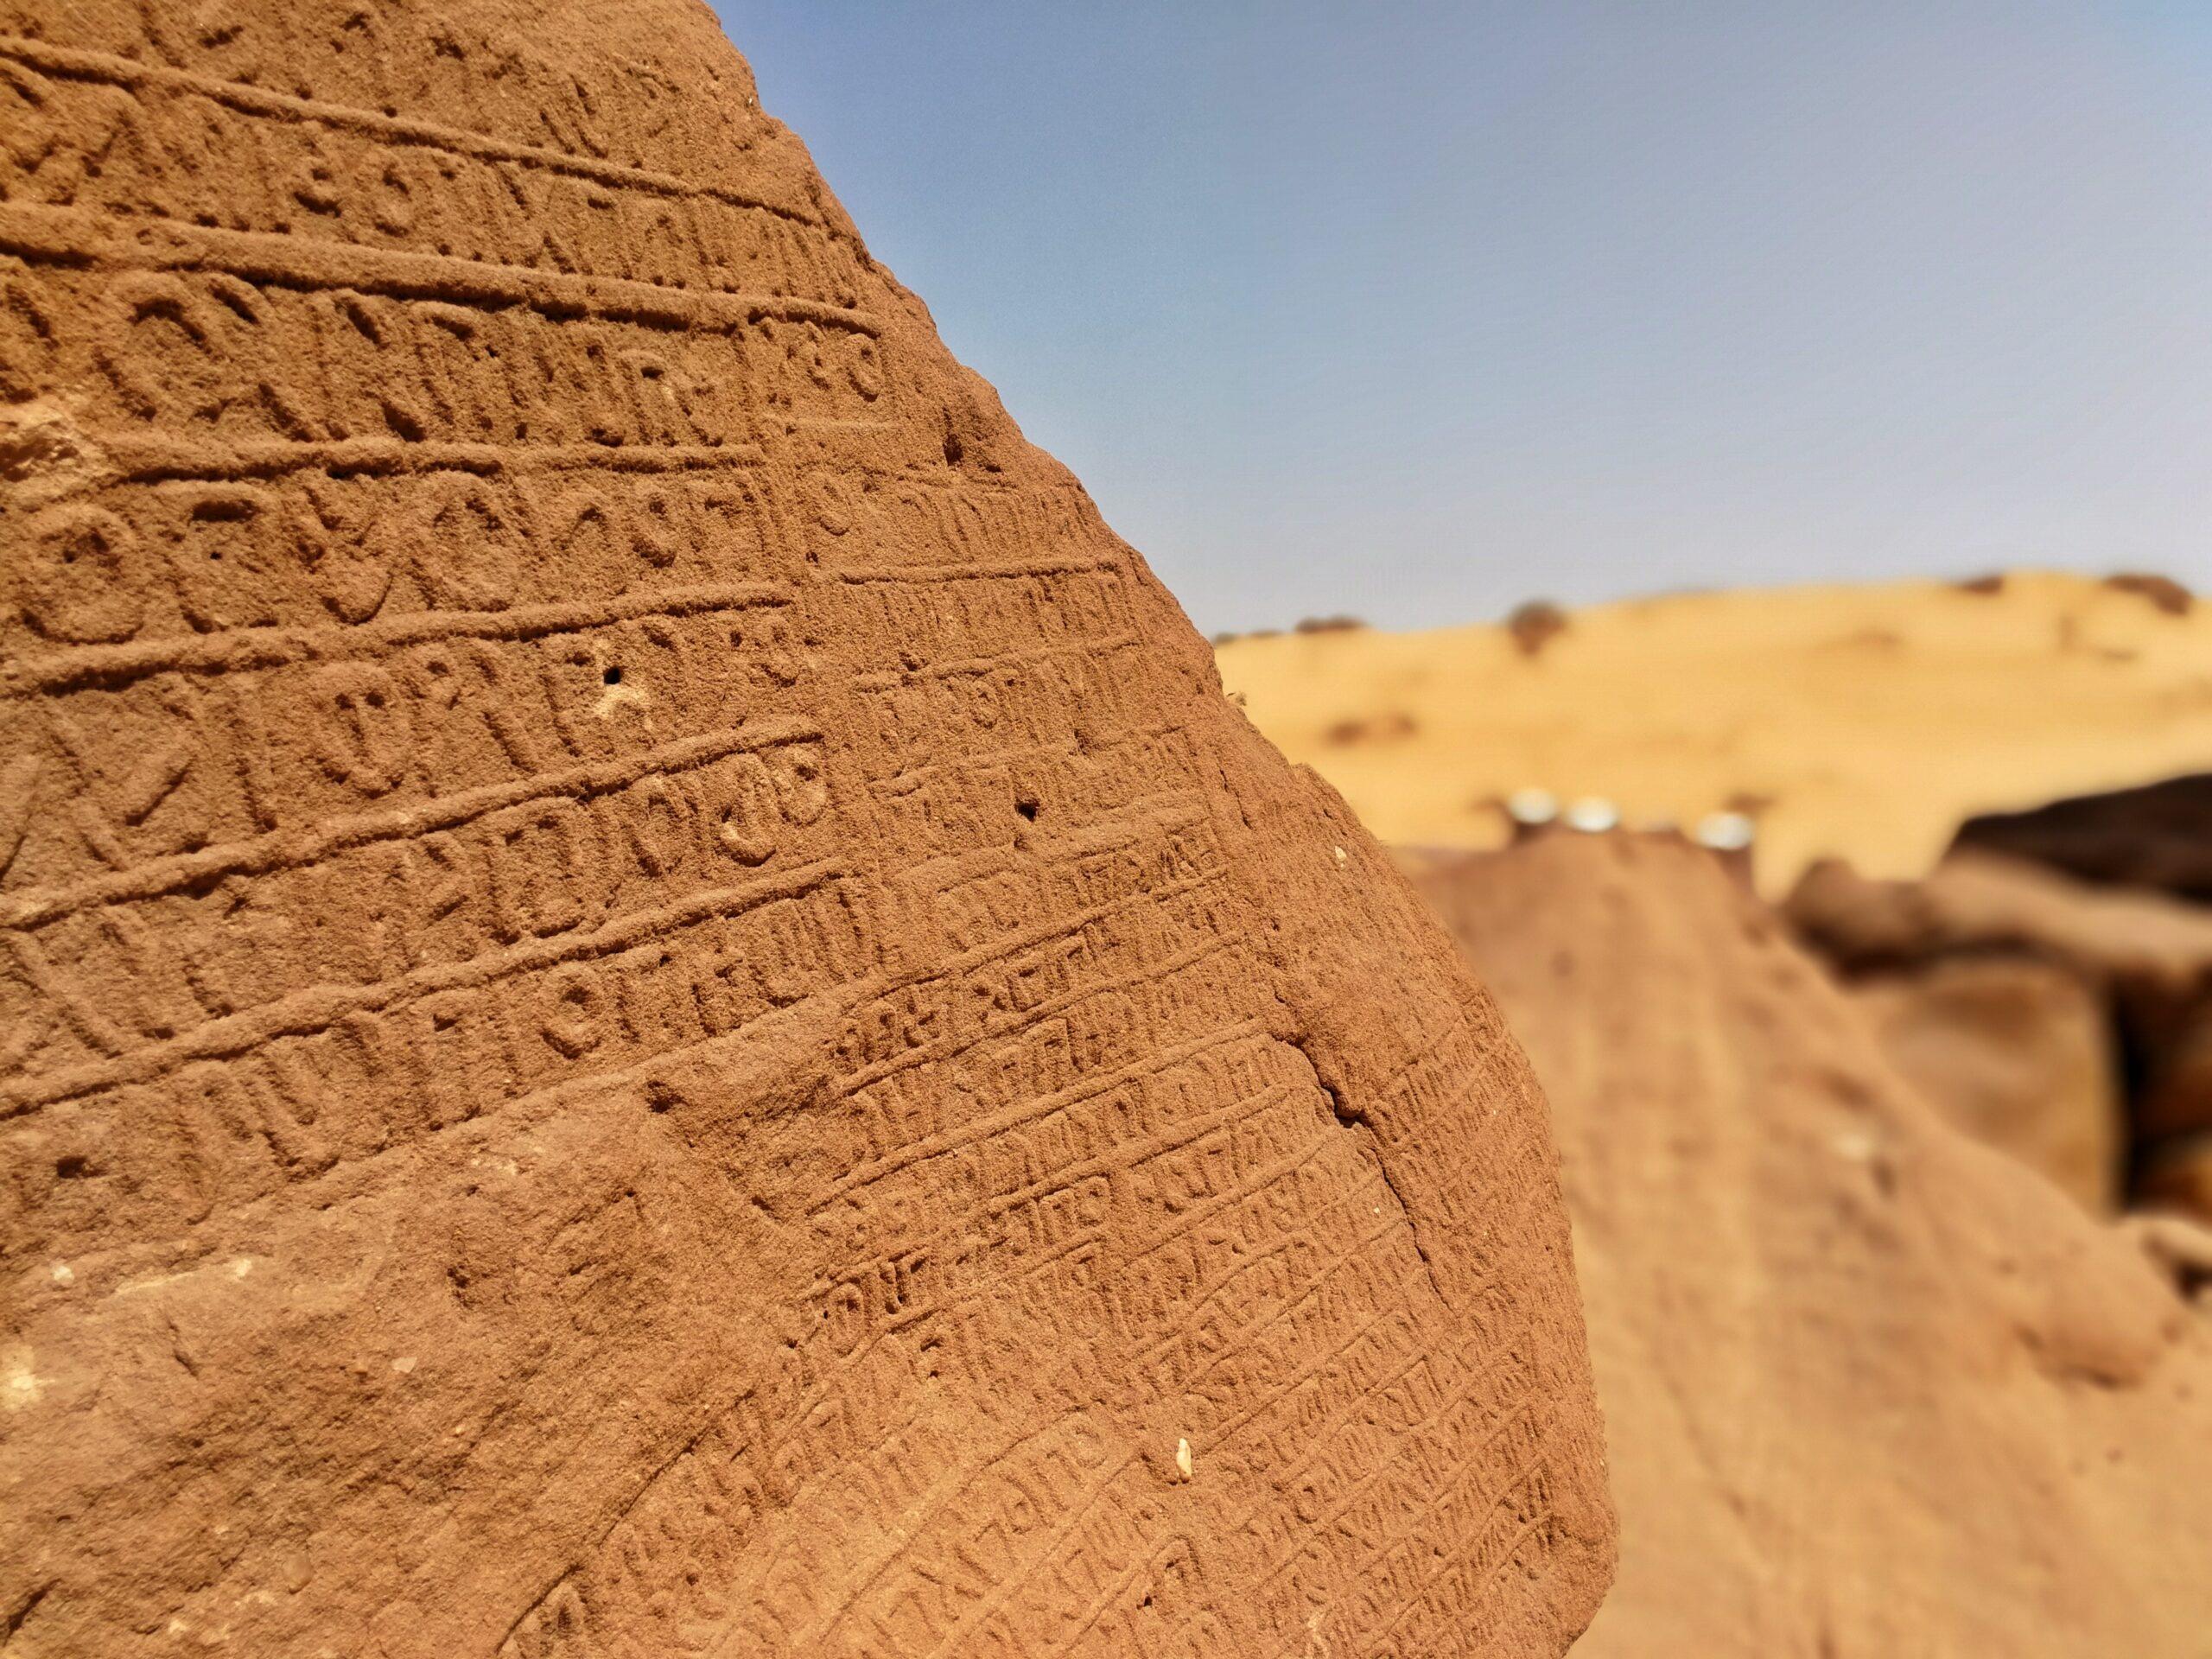 Inscriptions at Jabal Ikmah